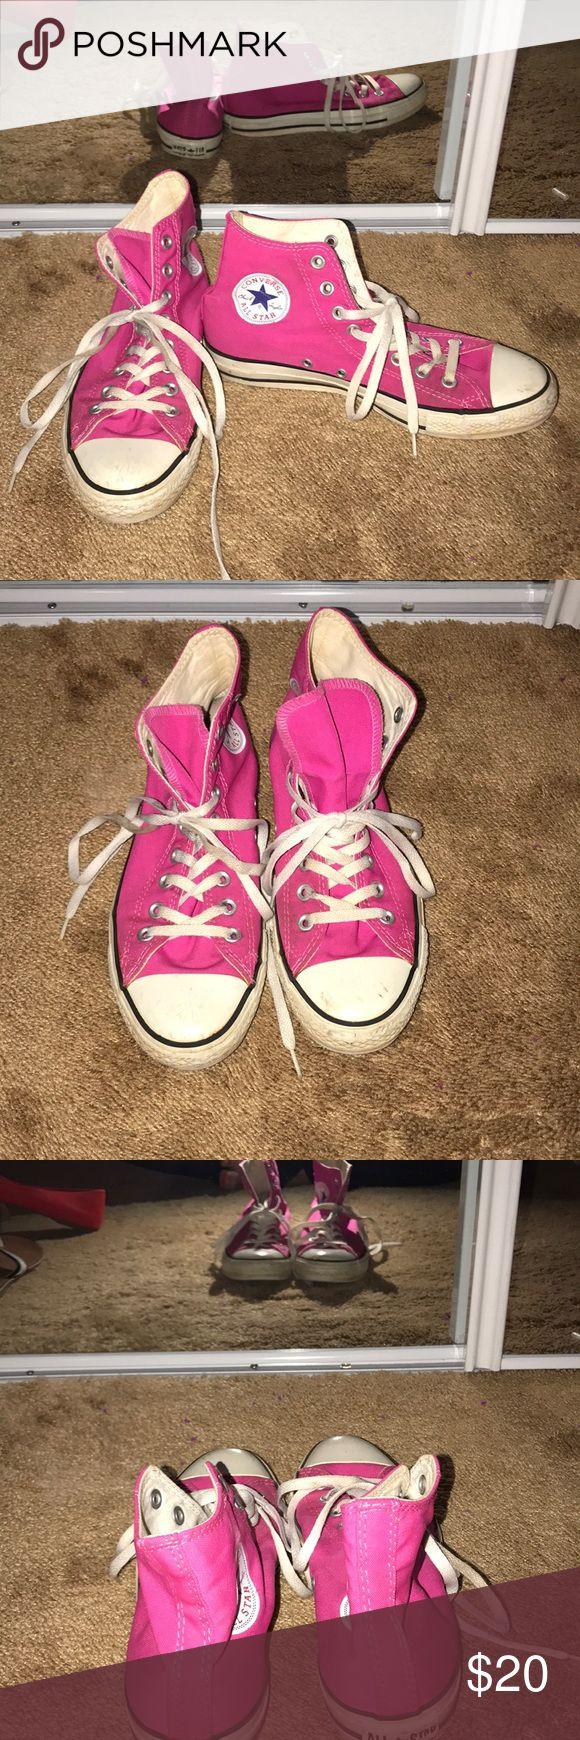 Hot pink converse high tops Super cute and comfy hot pink high top converse!!! Converse Shoes Sneakers